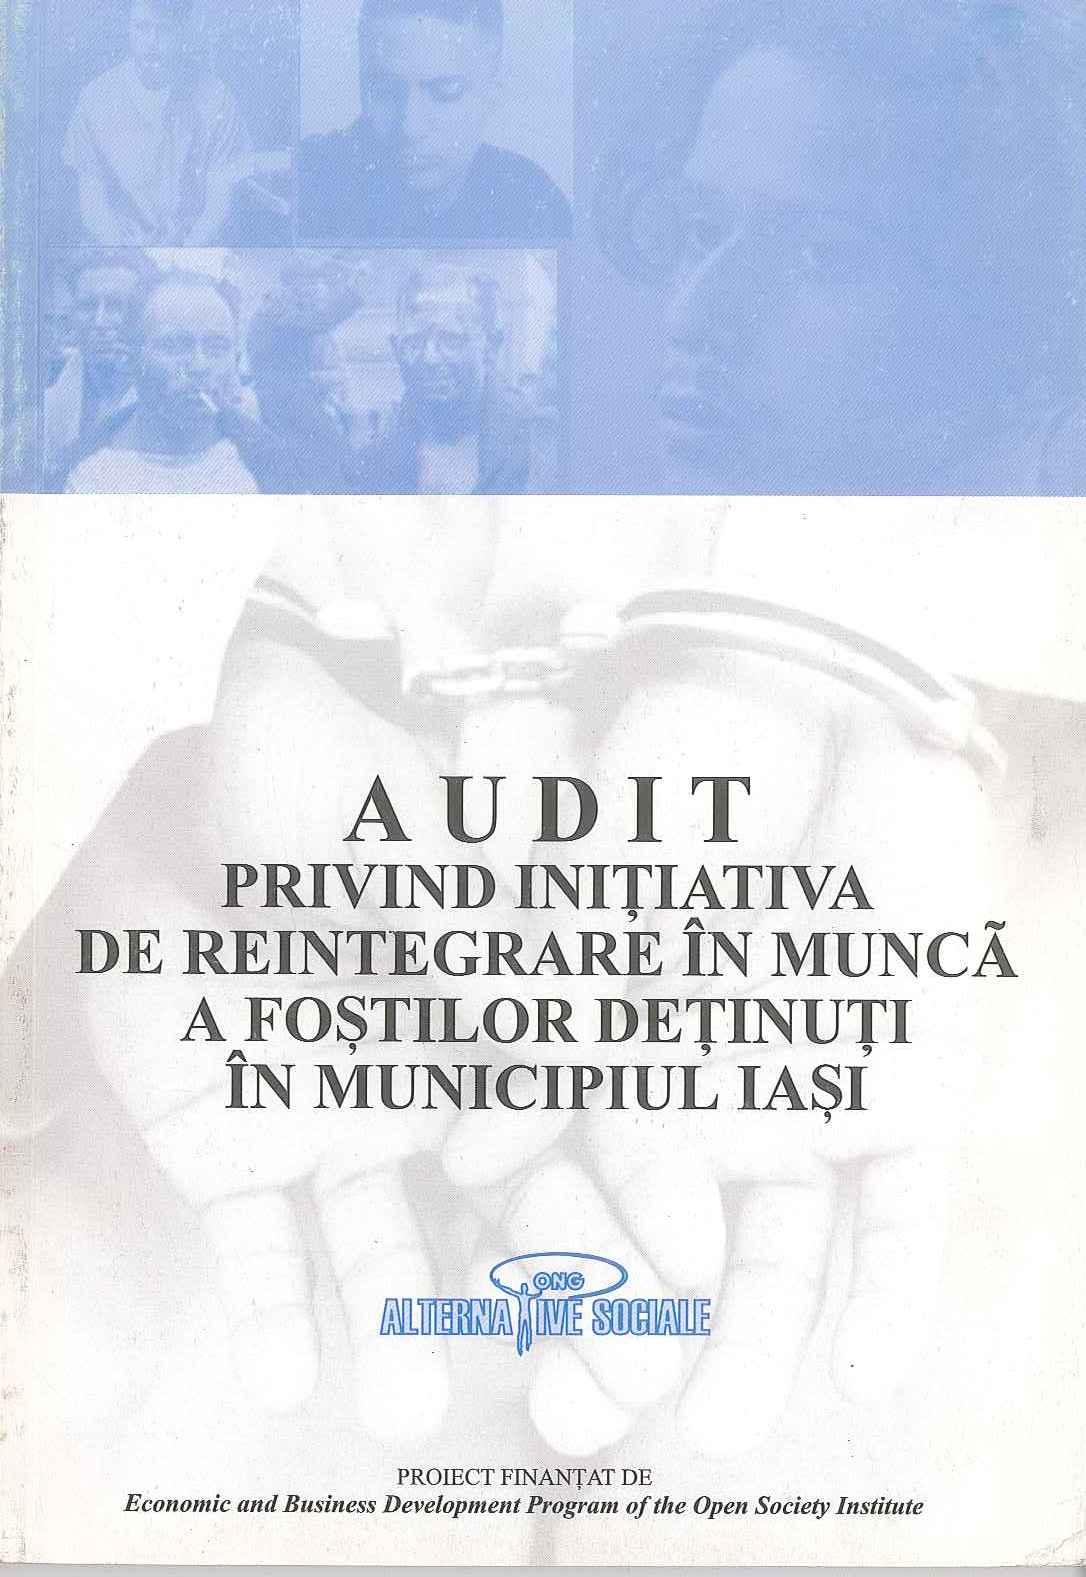 Audit privind integrarea detinutilor